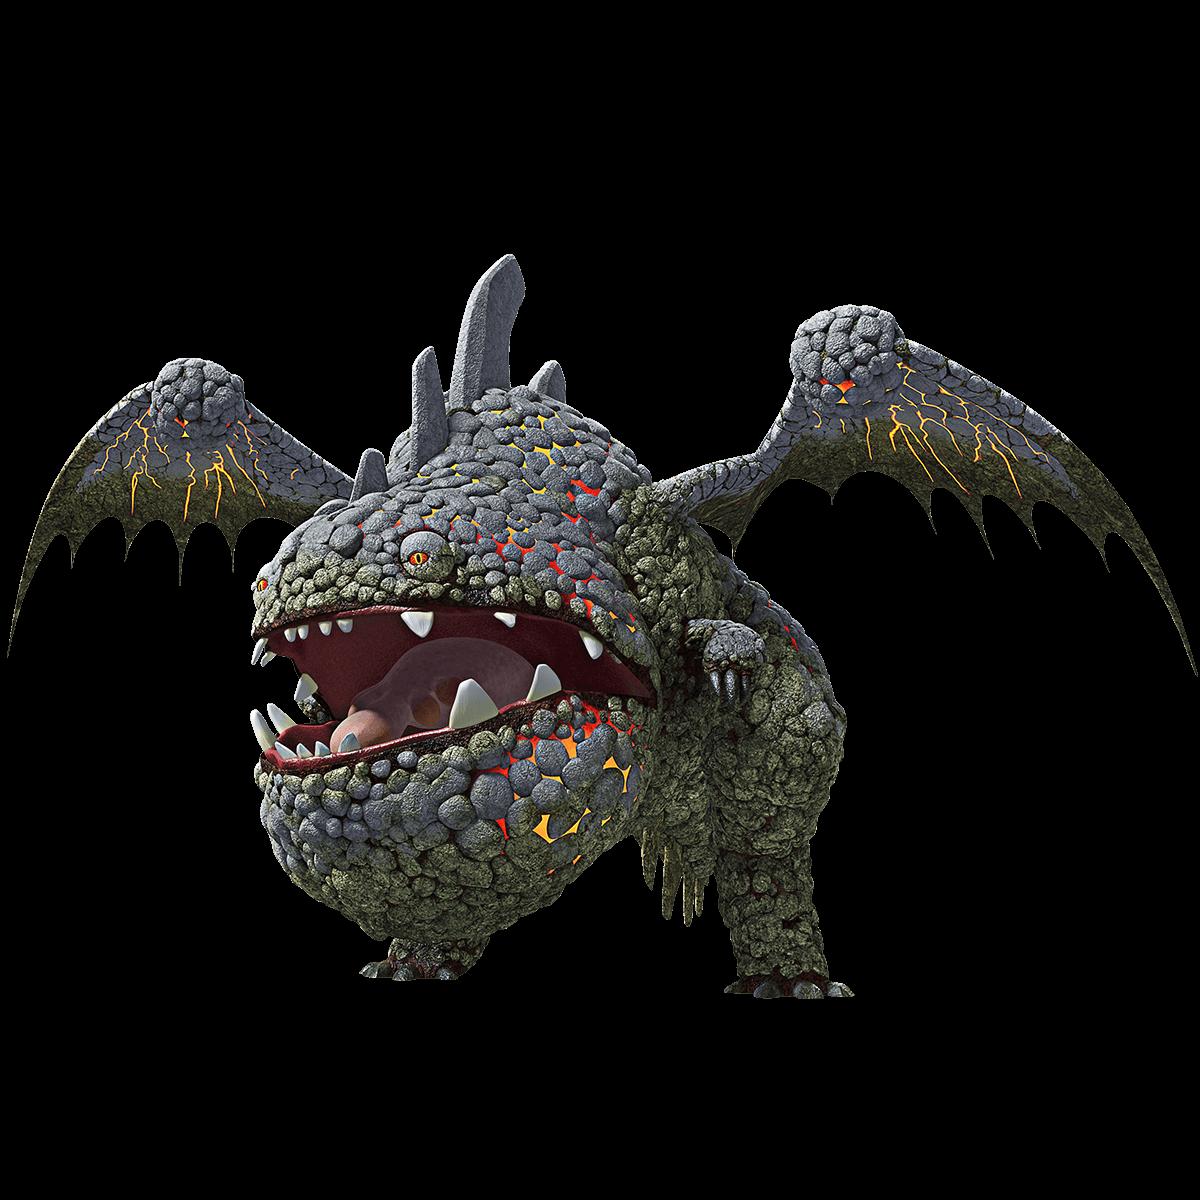 Eruptodon How To Train Your Dragon Wiki Fandom Powered